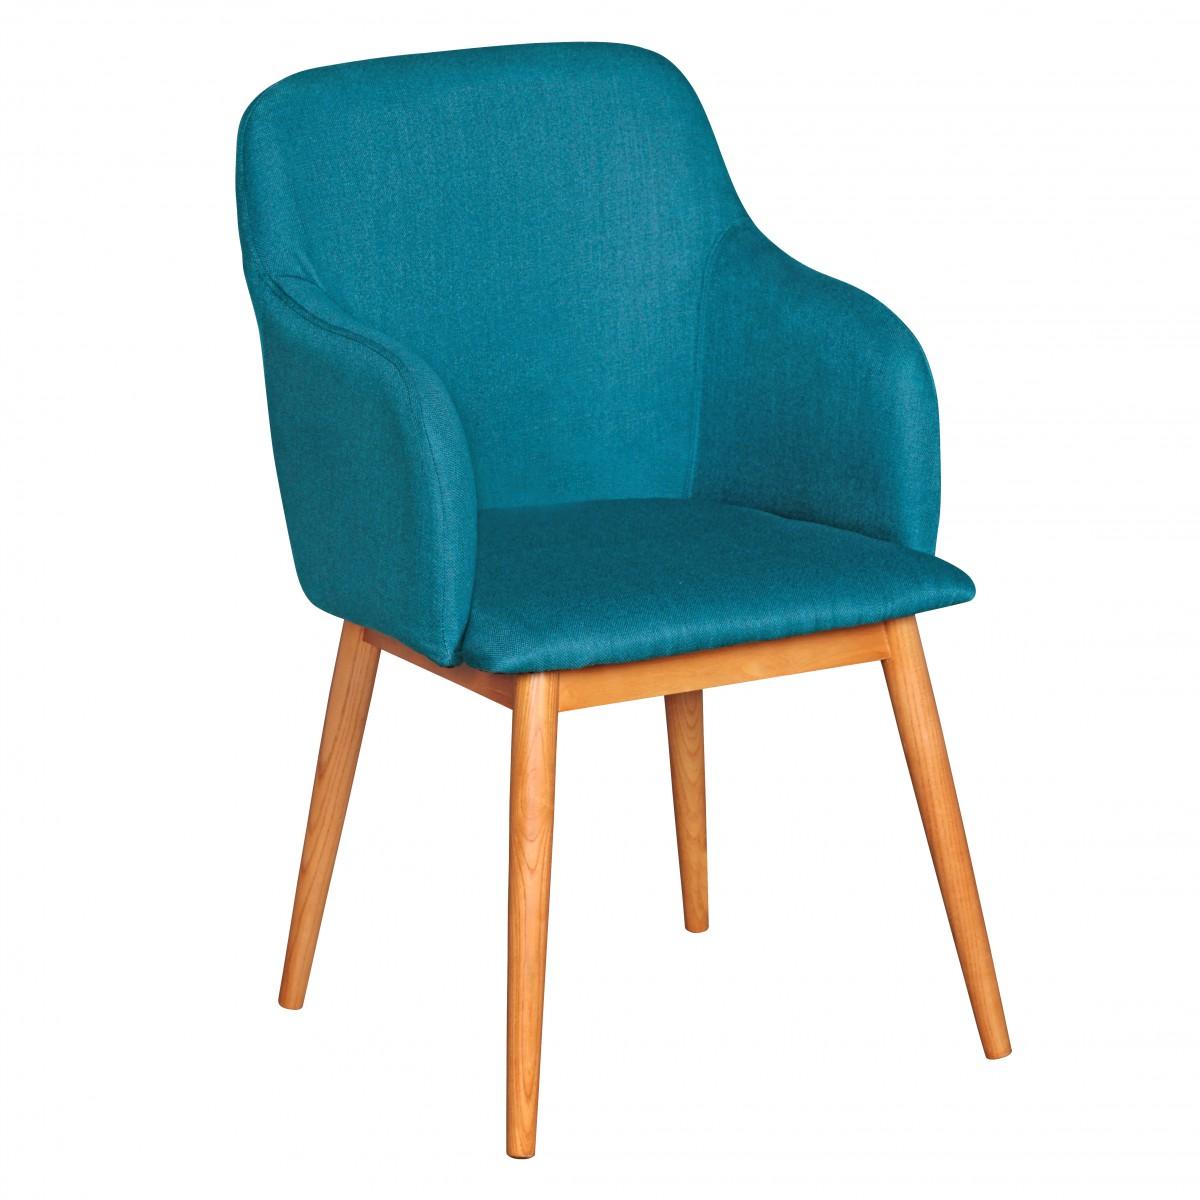 Finebuy silla de comedor retro silla tapizada silla - Tela para sillas de comedor ...